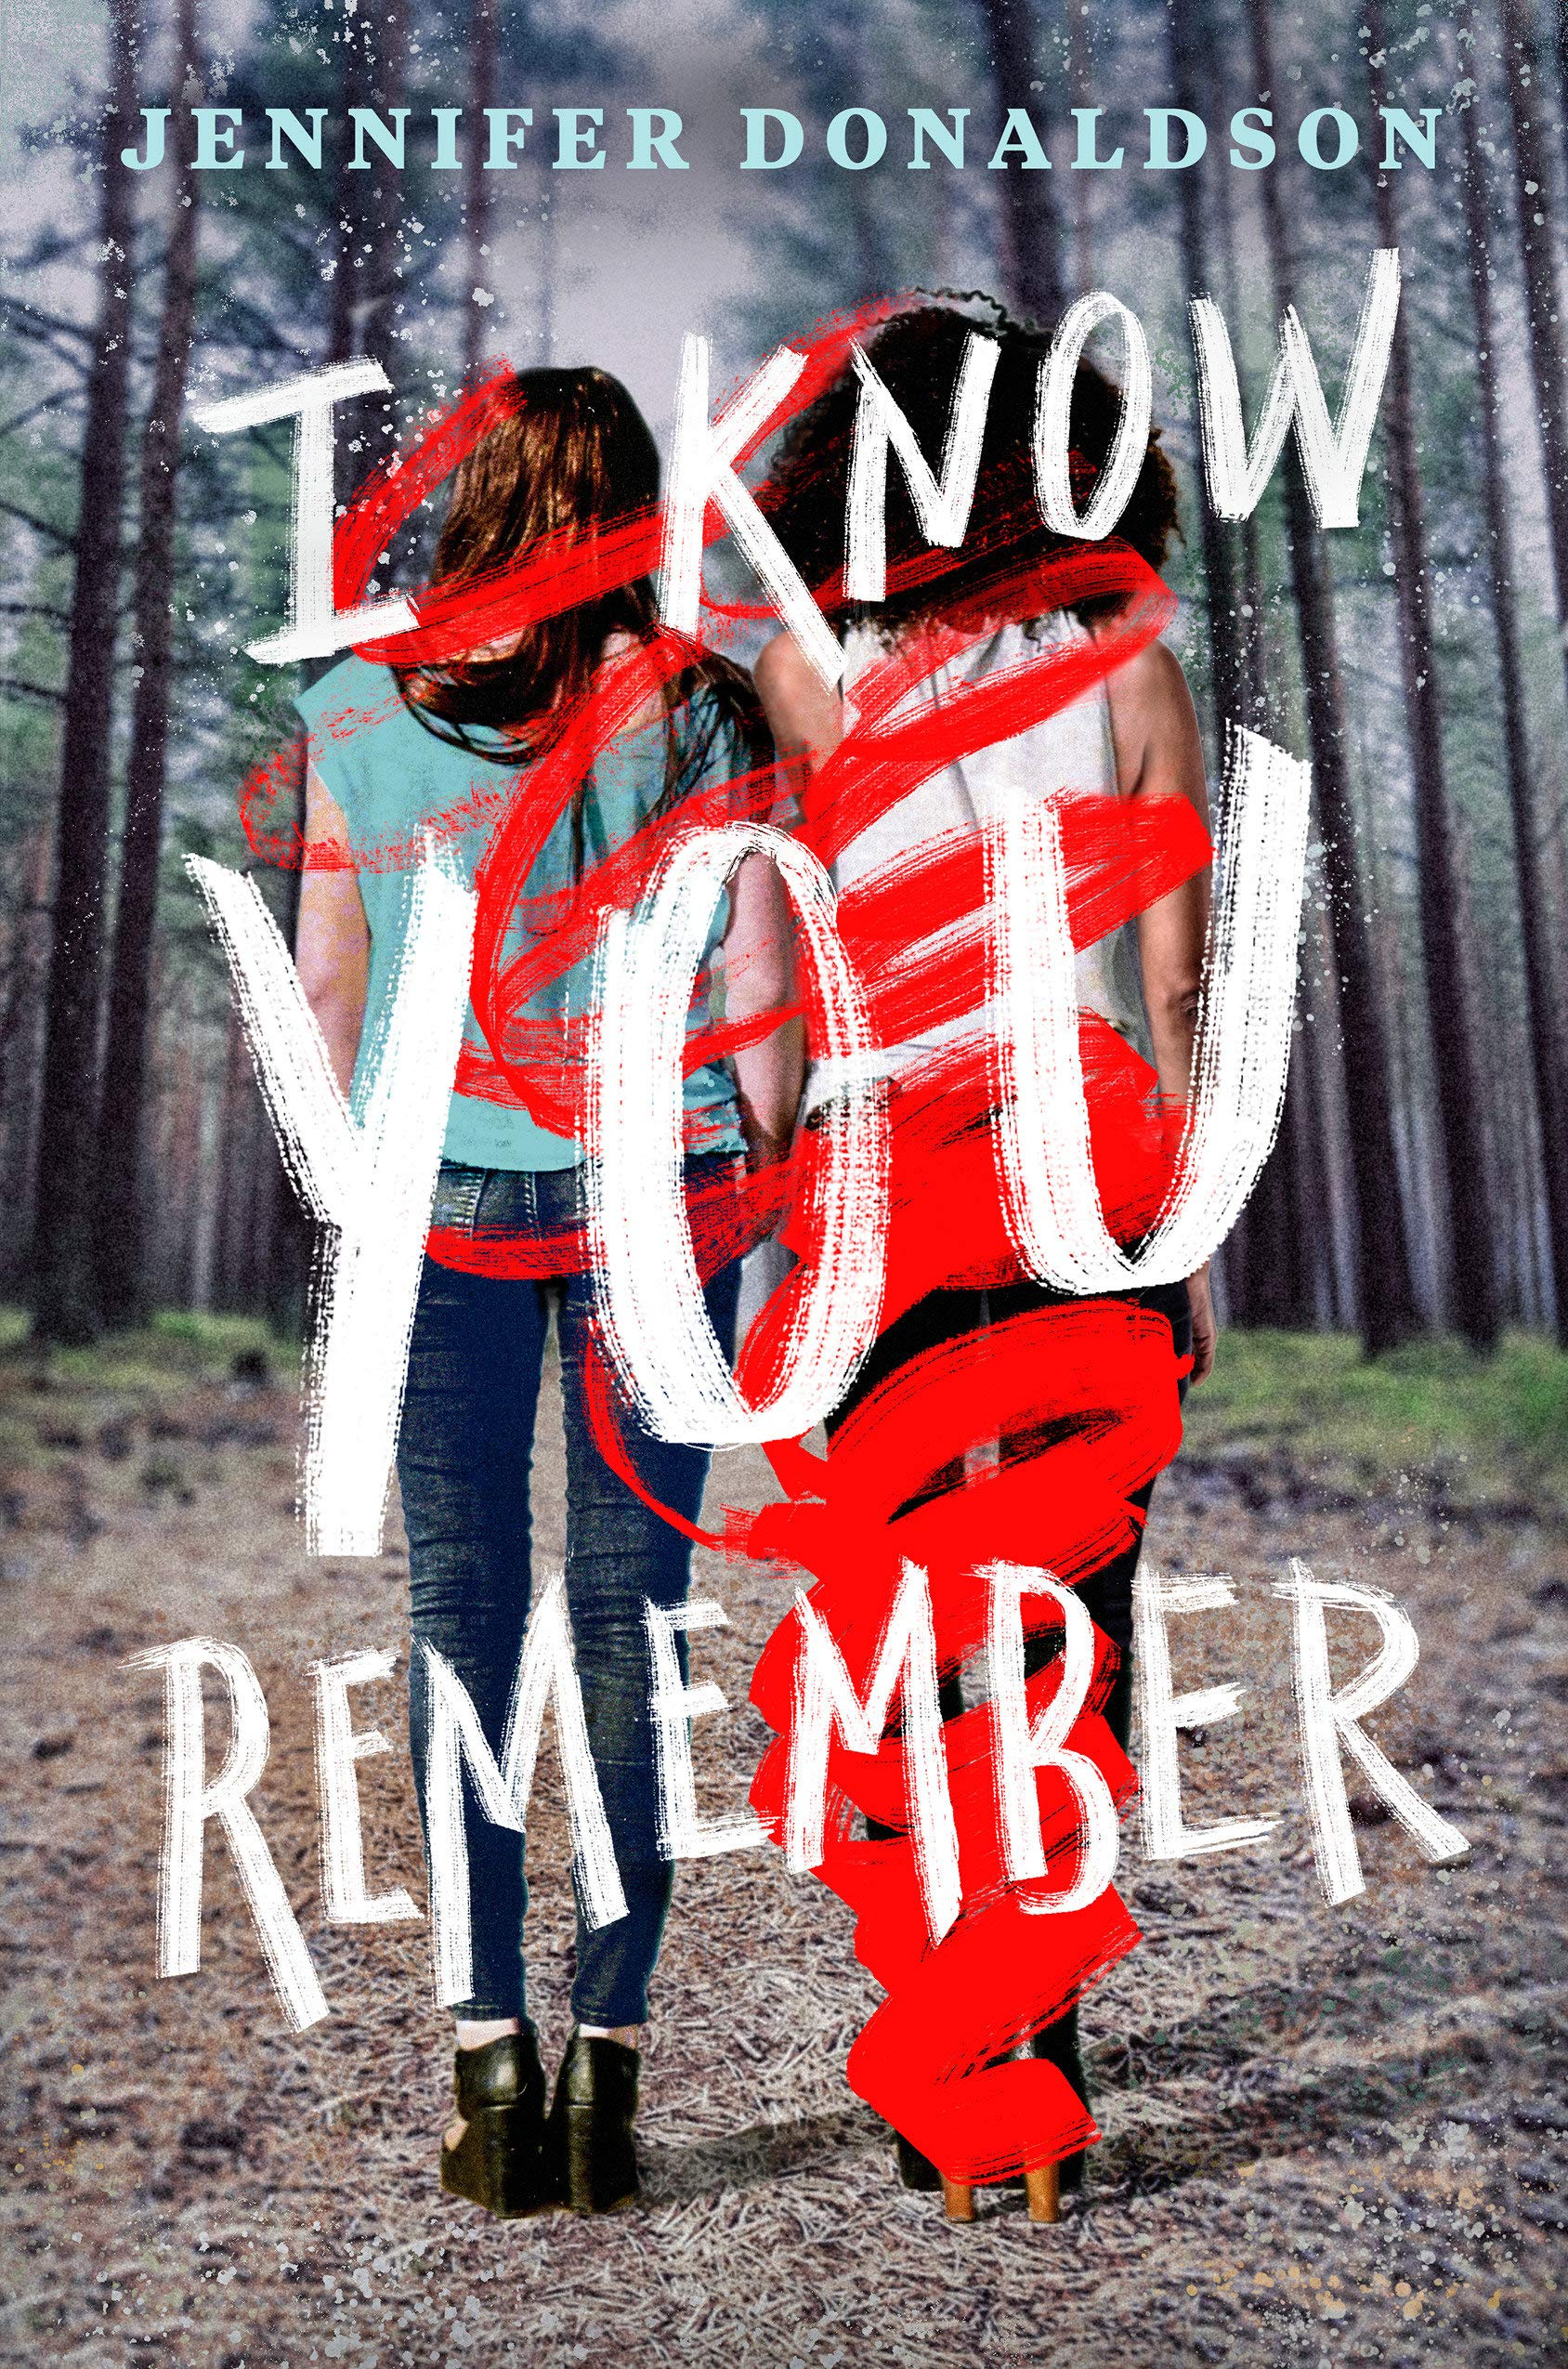 http://www.rosiebookaward.com/i-know-you-remember.html